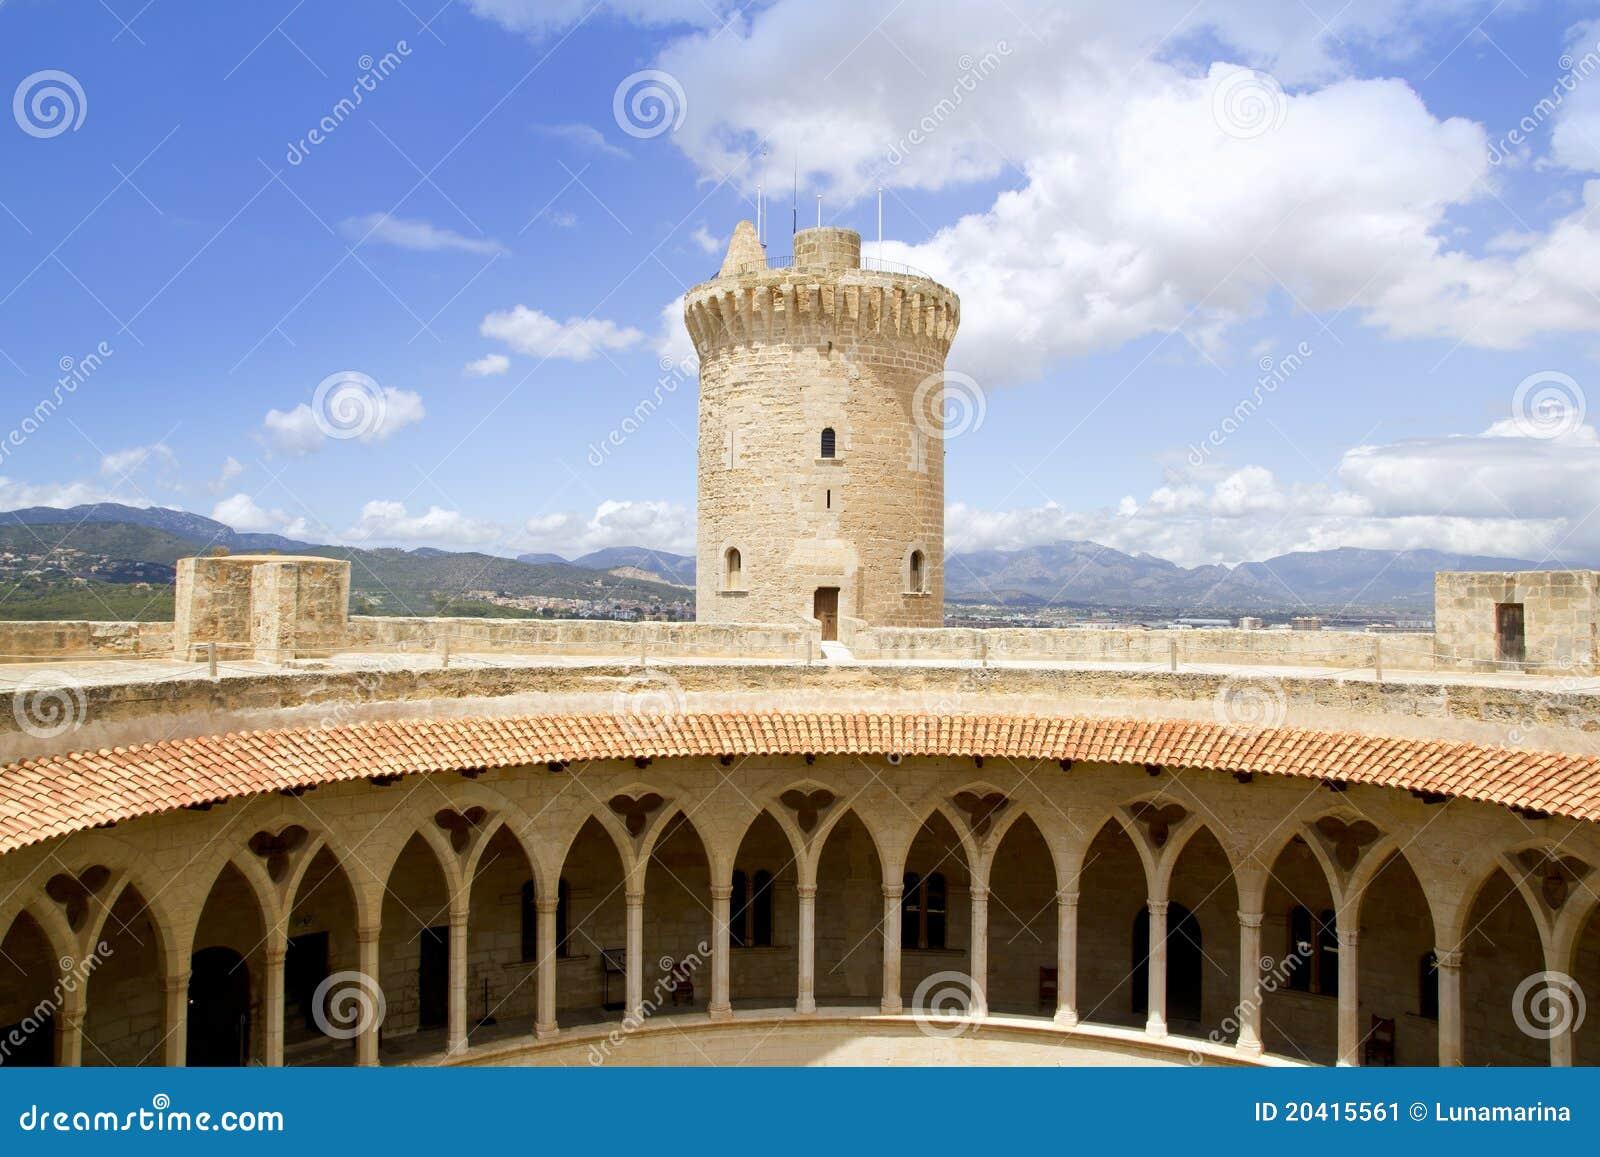 Download Castle Castillo De Bellver In Majorca Stock Image - Image of bastion, baleares: 20415561